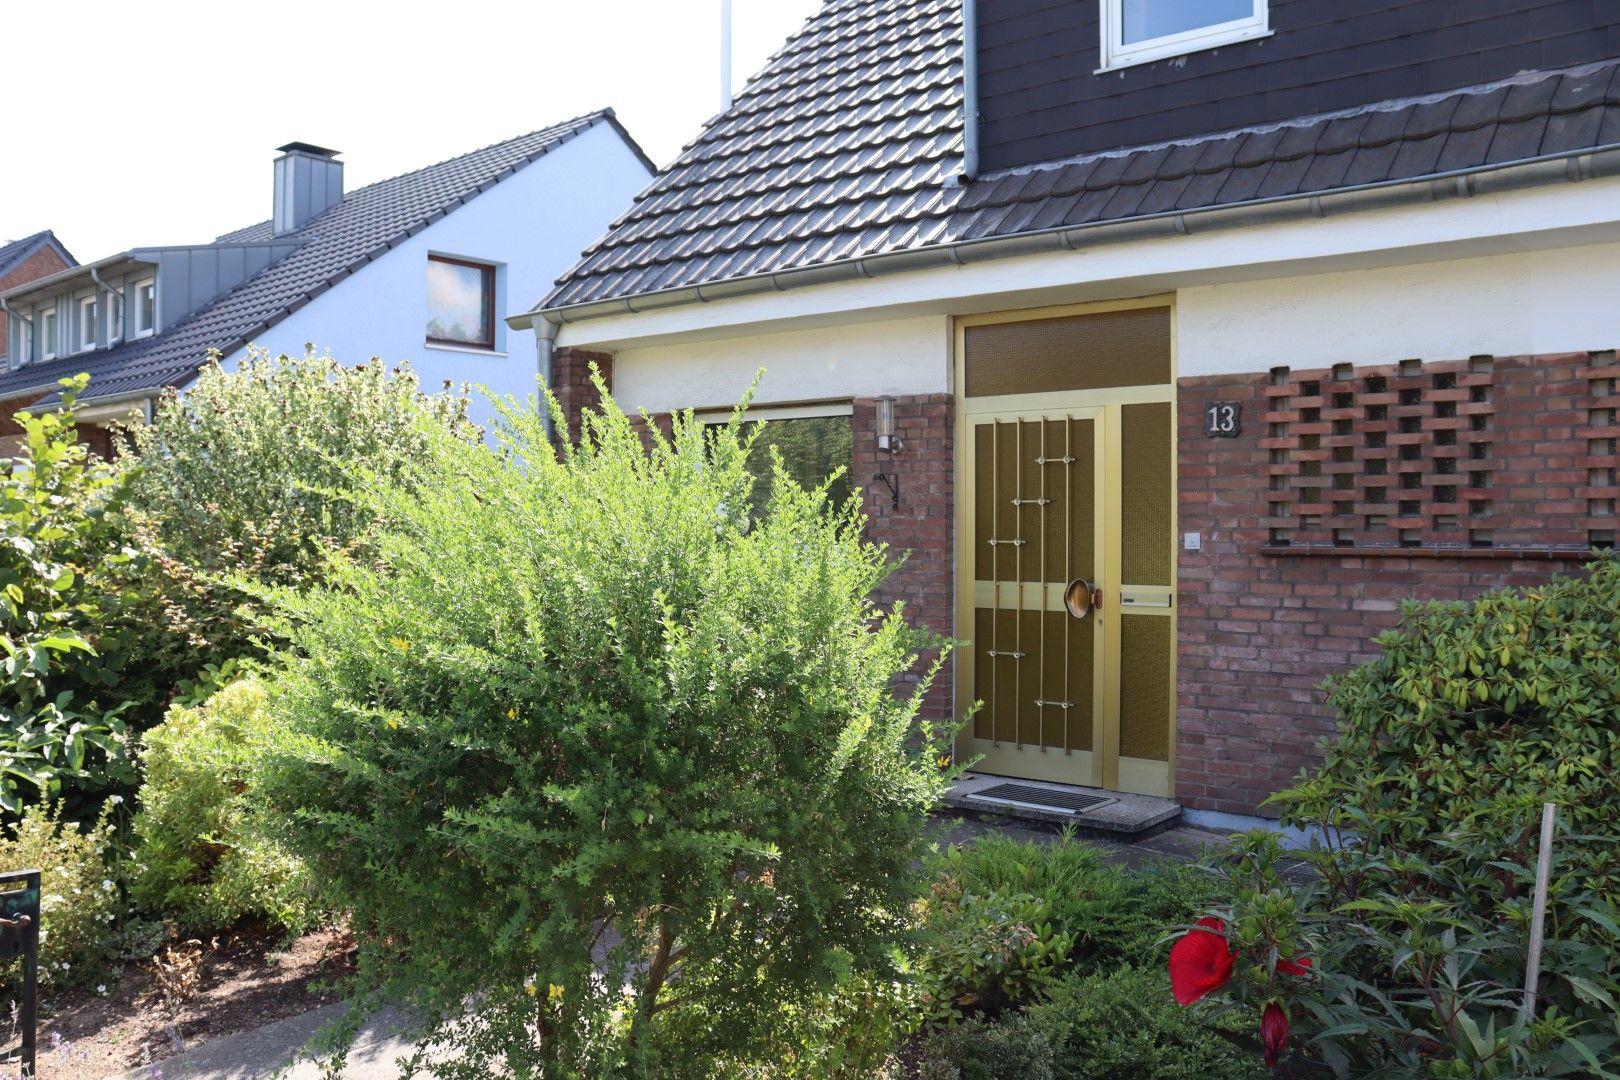 Immobilie Nr.0270 | Nelkenstraße 13, 40668 Meerbusch - Lank